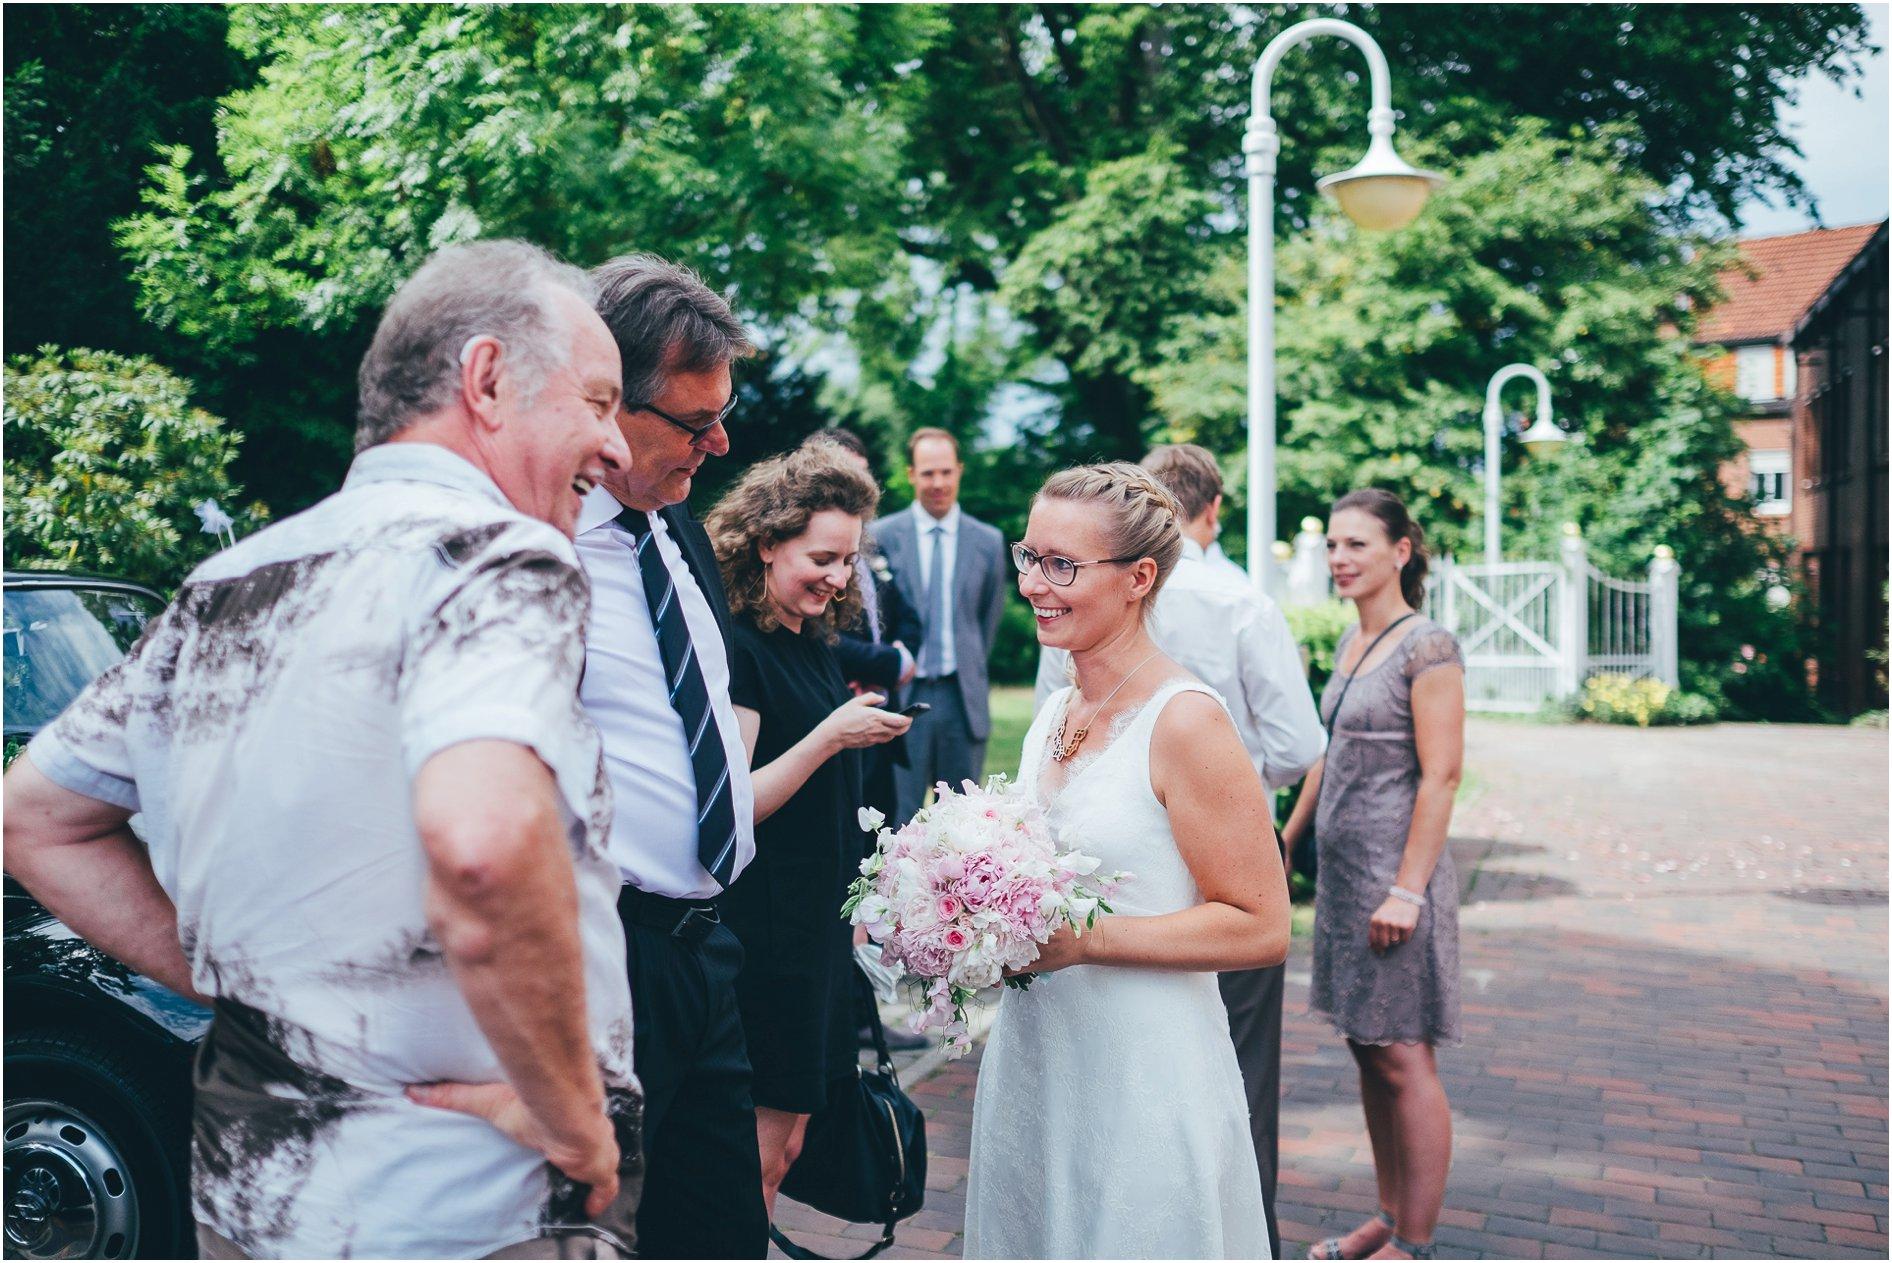 2016-04-19_0011 Sandra & Janis - Hochzeitsfotograf in Seevetal